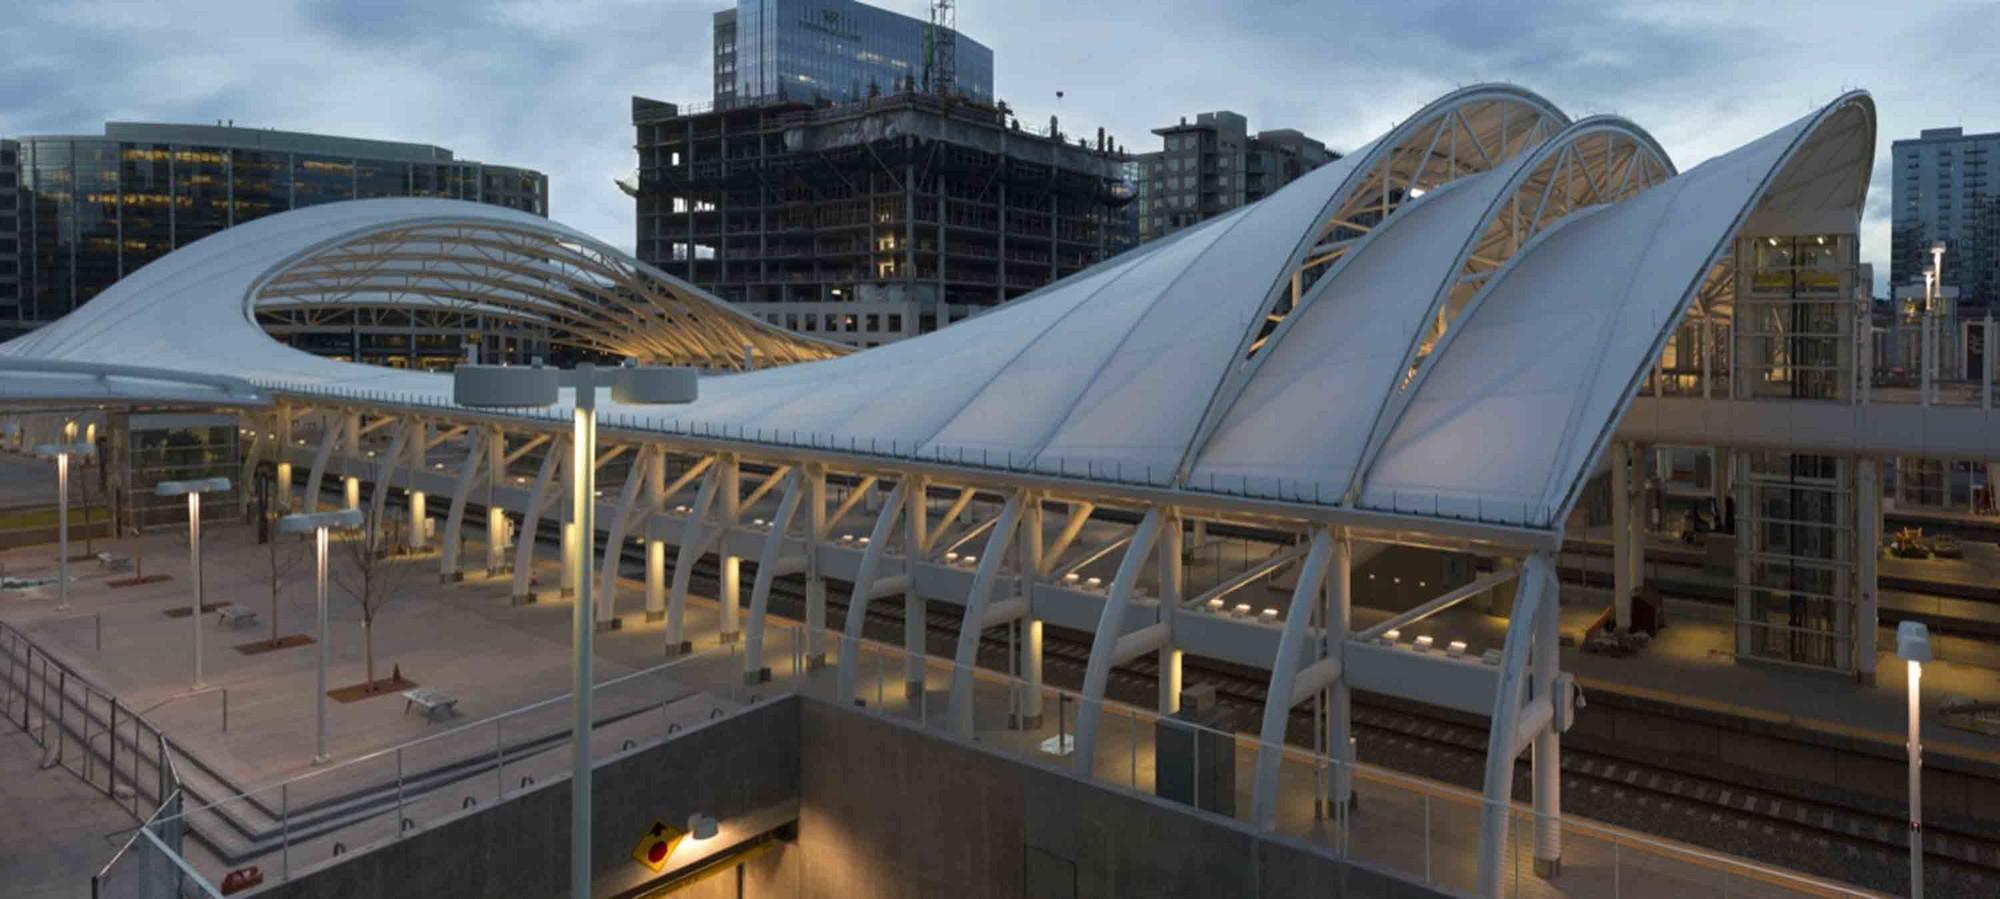 Denver Union Station Som Archdaily